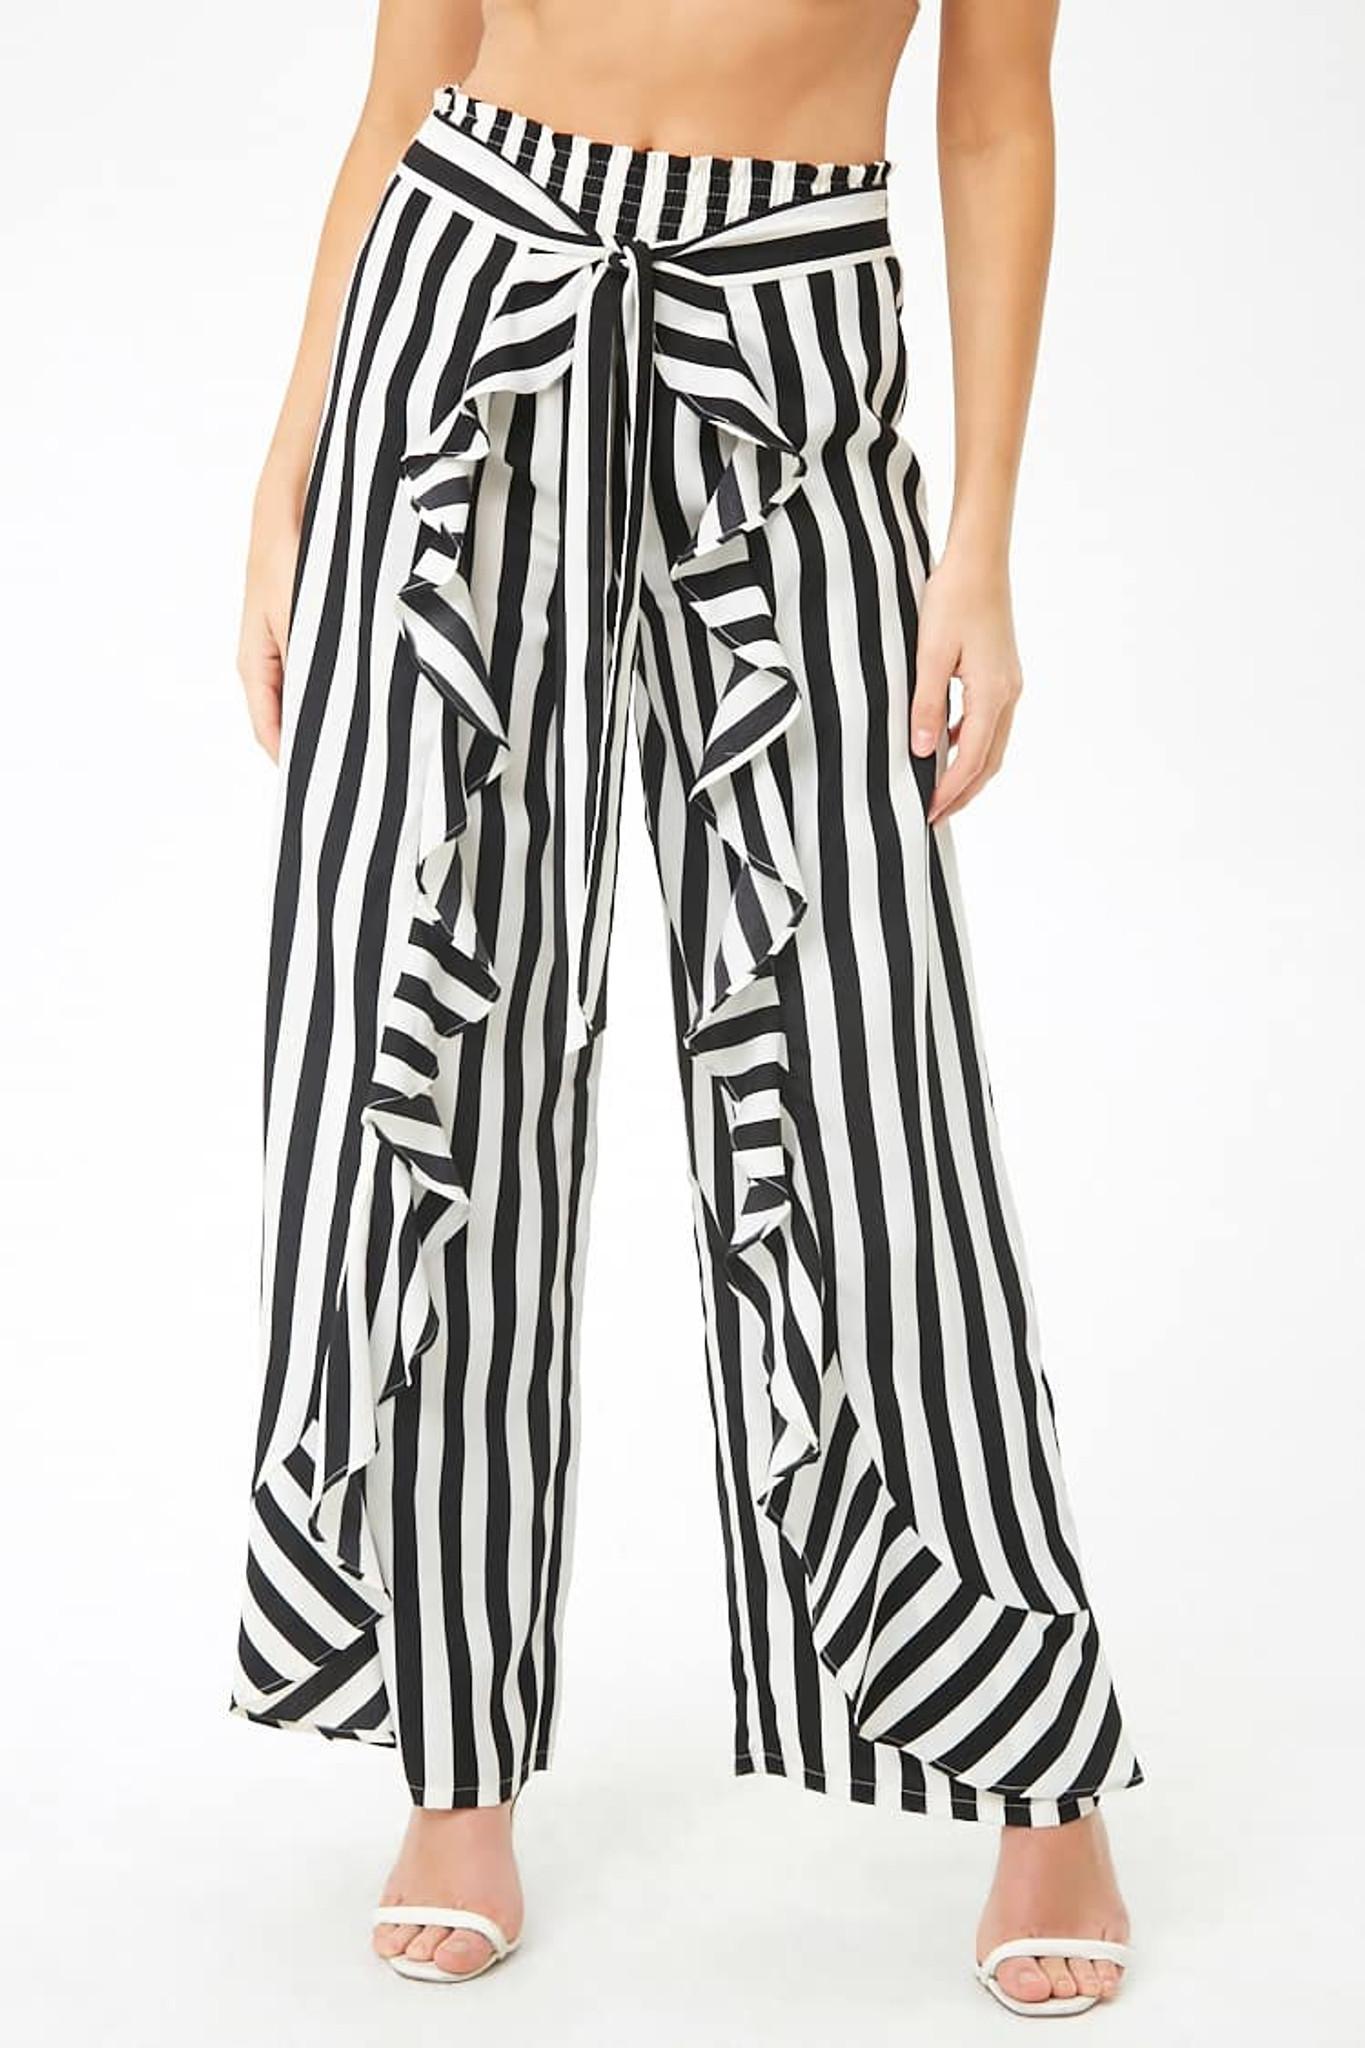 Fifth Avenue Viscose JOLL Stripe Tie-Waist Front Frill Full Length Wide Leg Pants